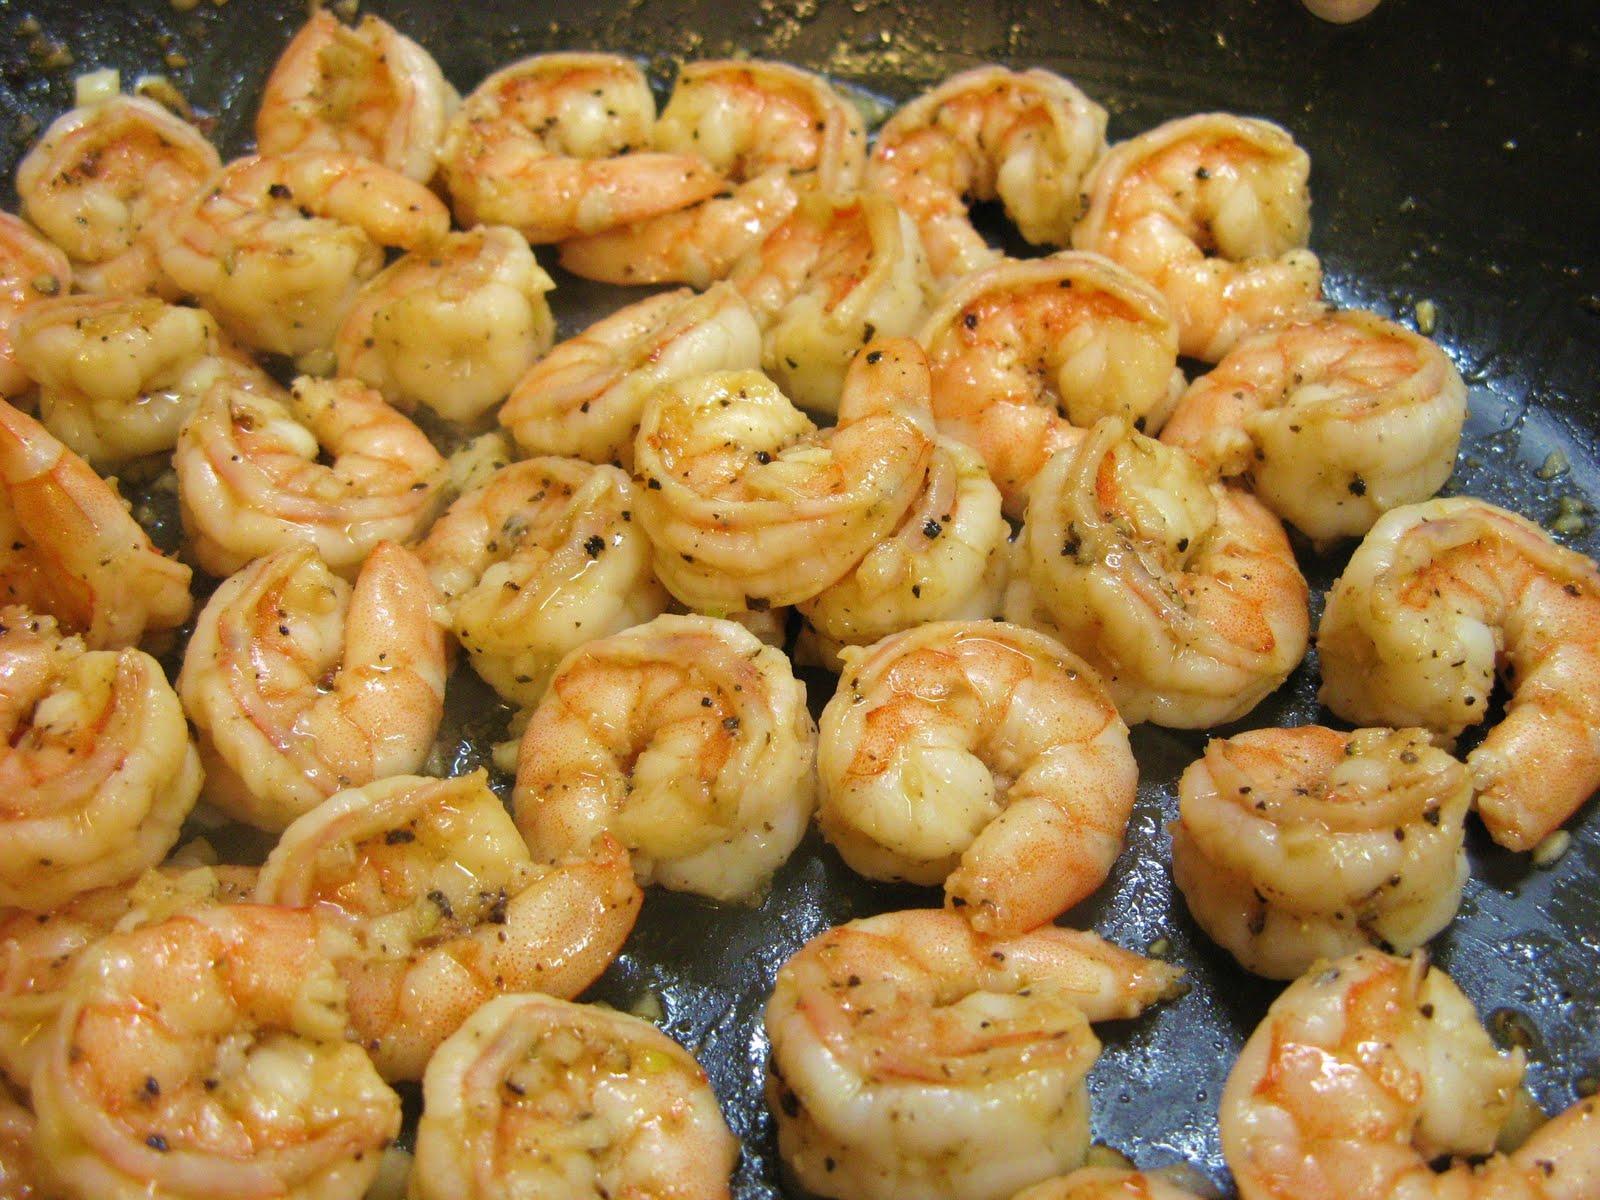 The Well-Fed Newlyweds: Peppery Garlic Prawns